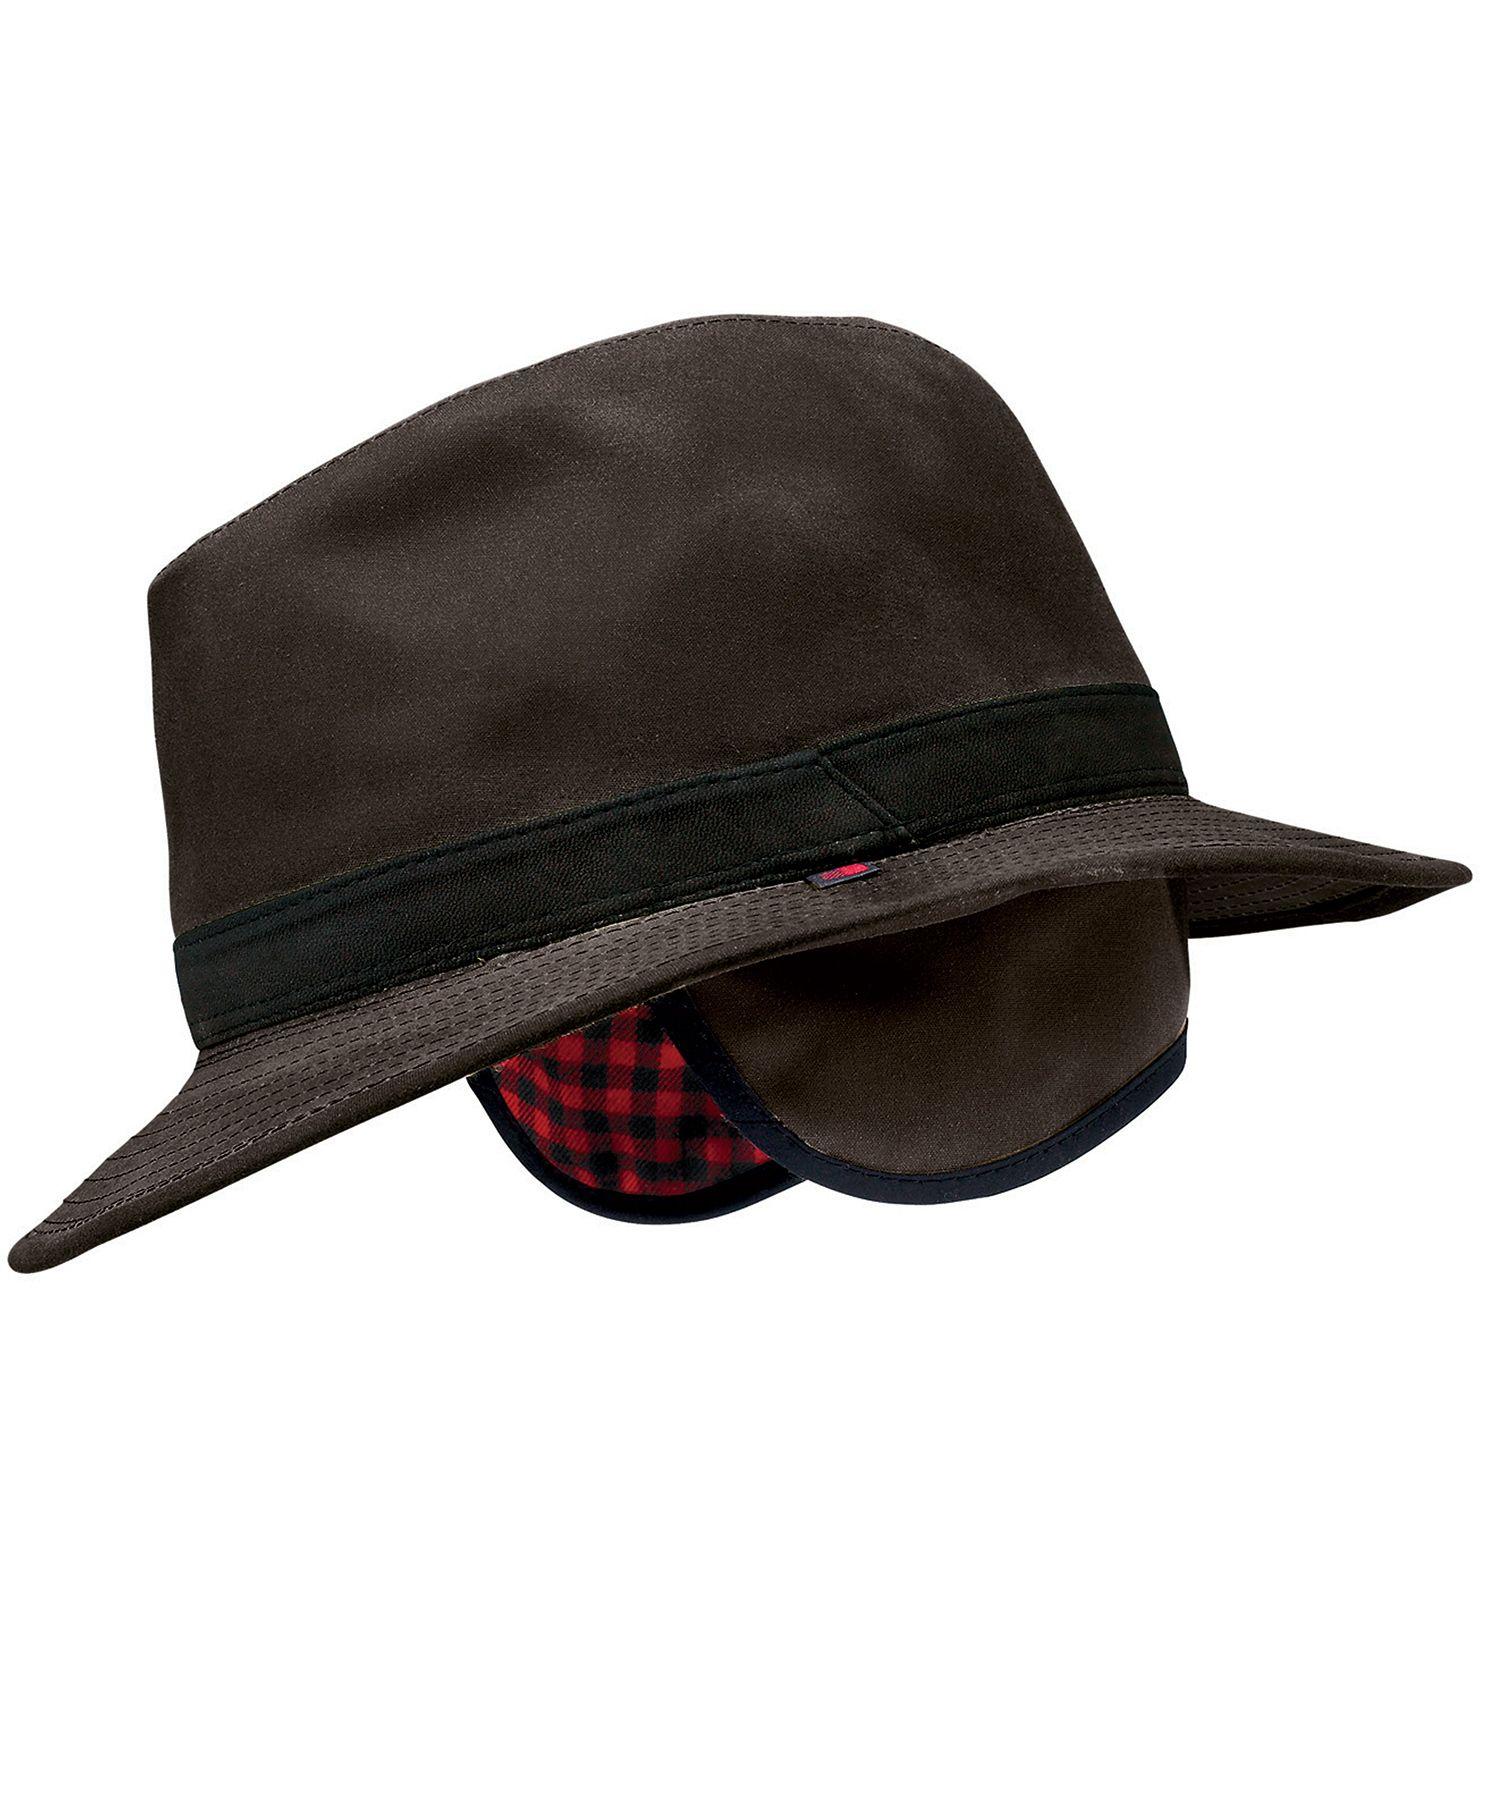 77cbc0b32ca91 Oil Cloth Safari Hat by WOOLRICH®